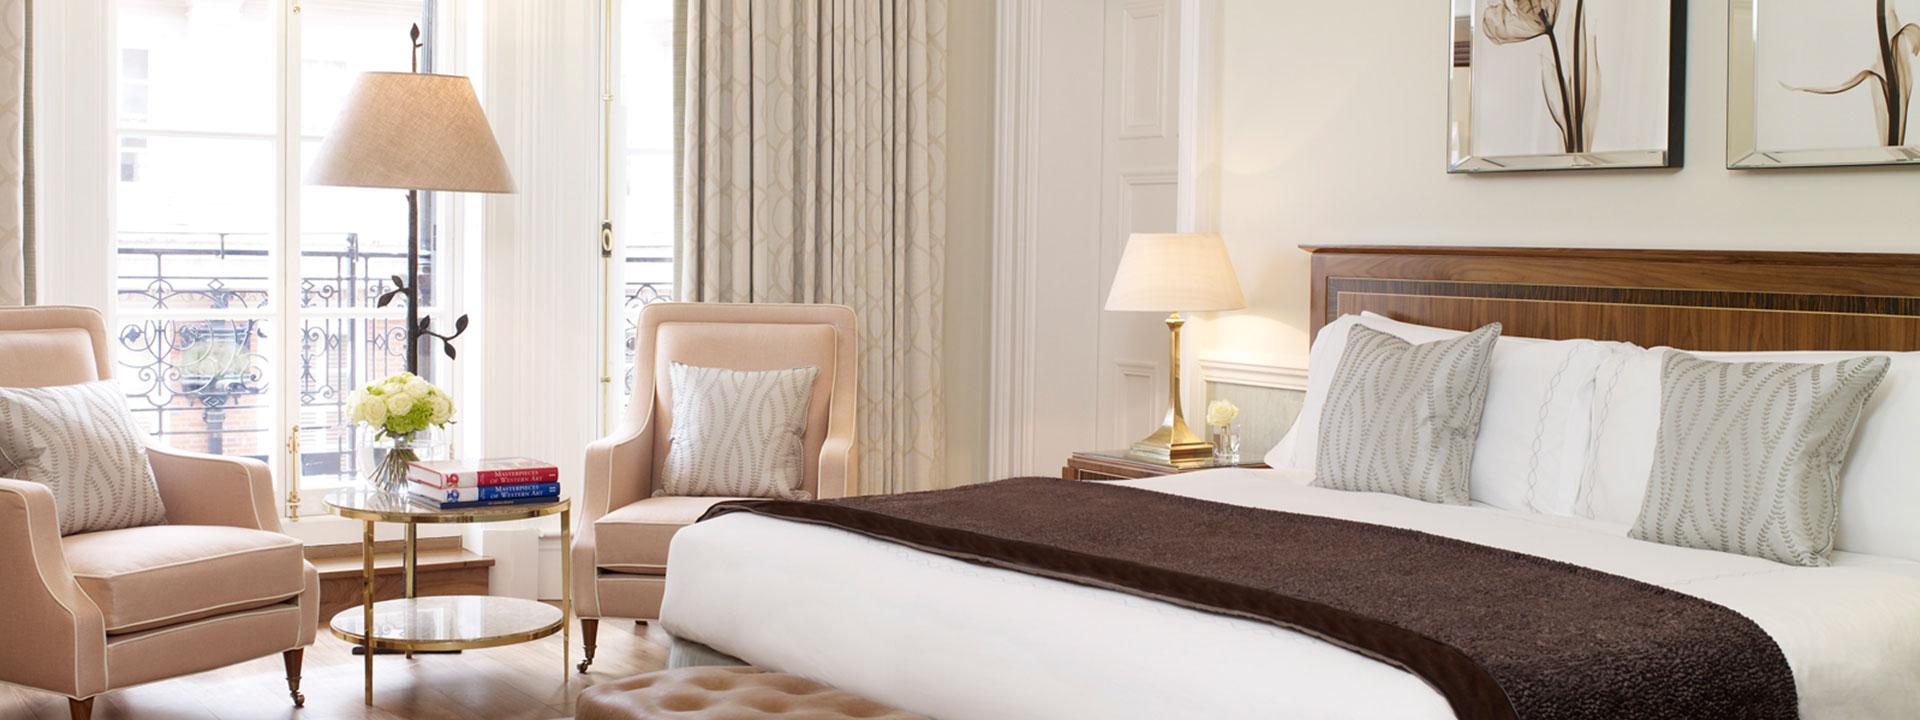 Mayfair King Room